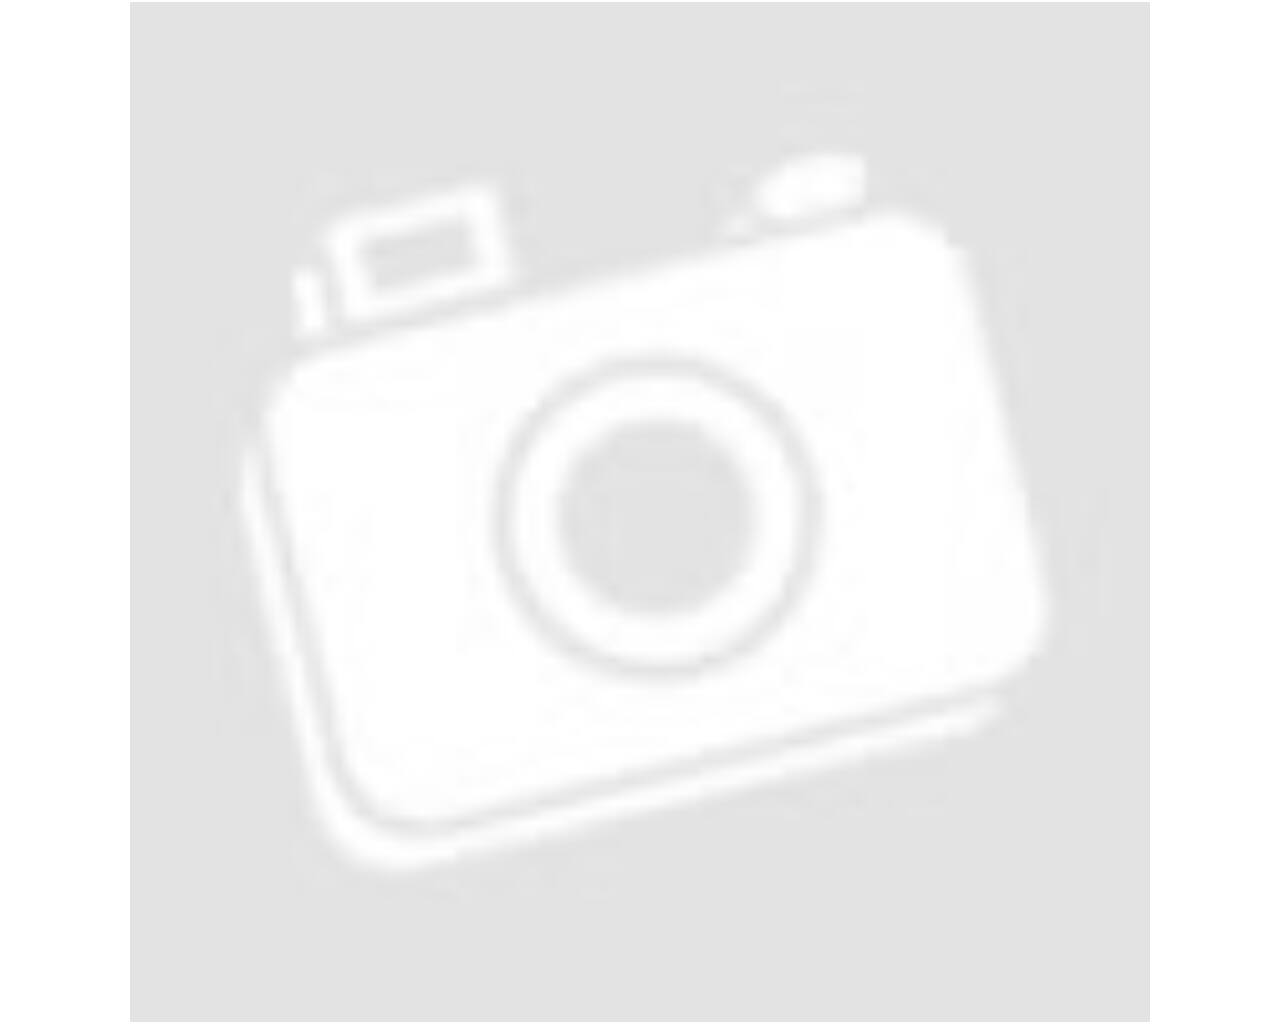 BELSŐ SAROK VOX MOLID 55 X 22 MM 2 DB / CSOMAG